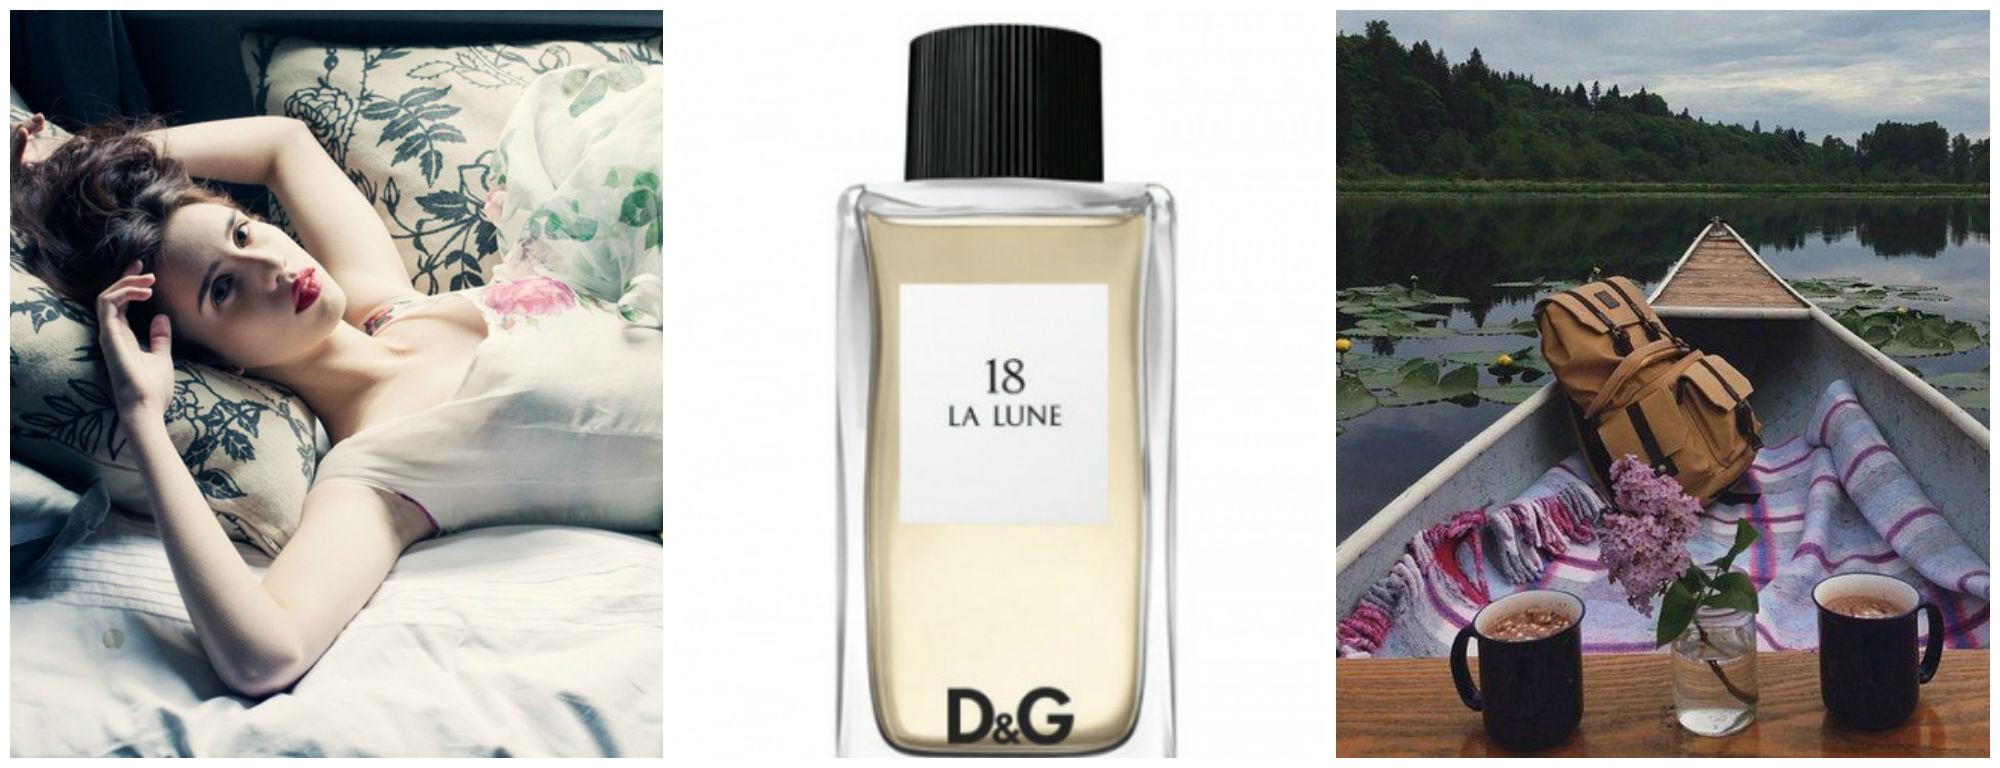 Dolce And Gabbana 18 La Lune Perfume Review